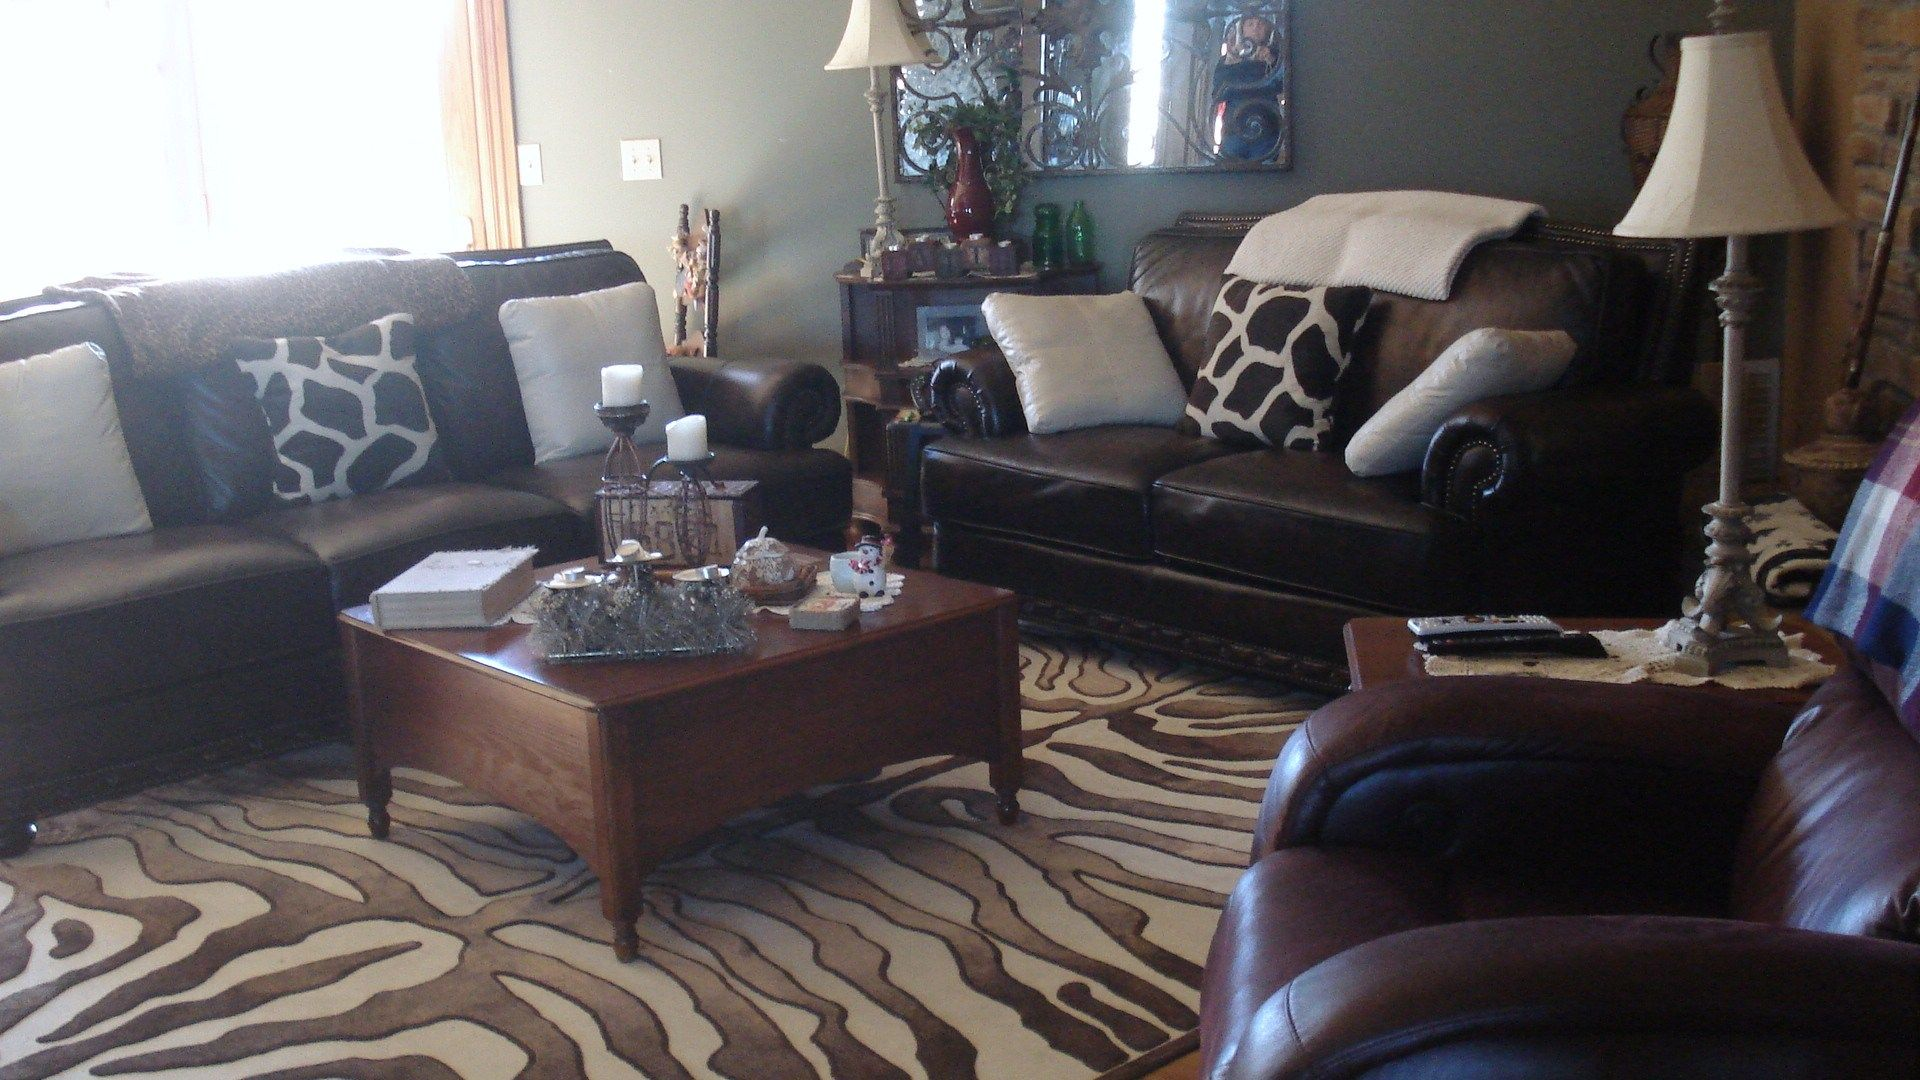 animal print living room beautiful living room patterned rug animal print ottoman blue walls i. Black Bedroom Furniture Sets. Home Design Ideas